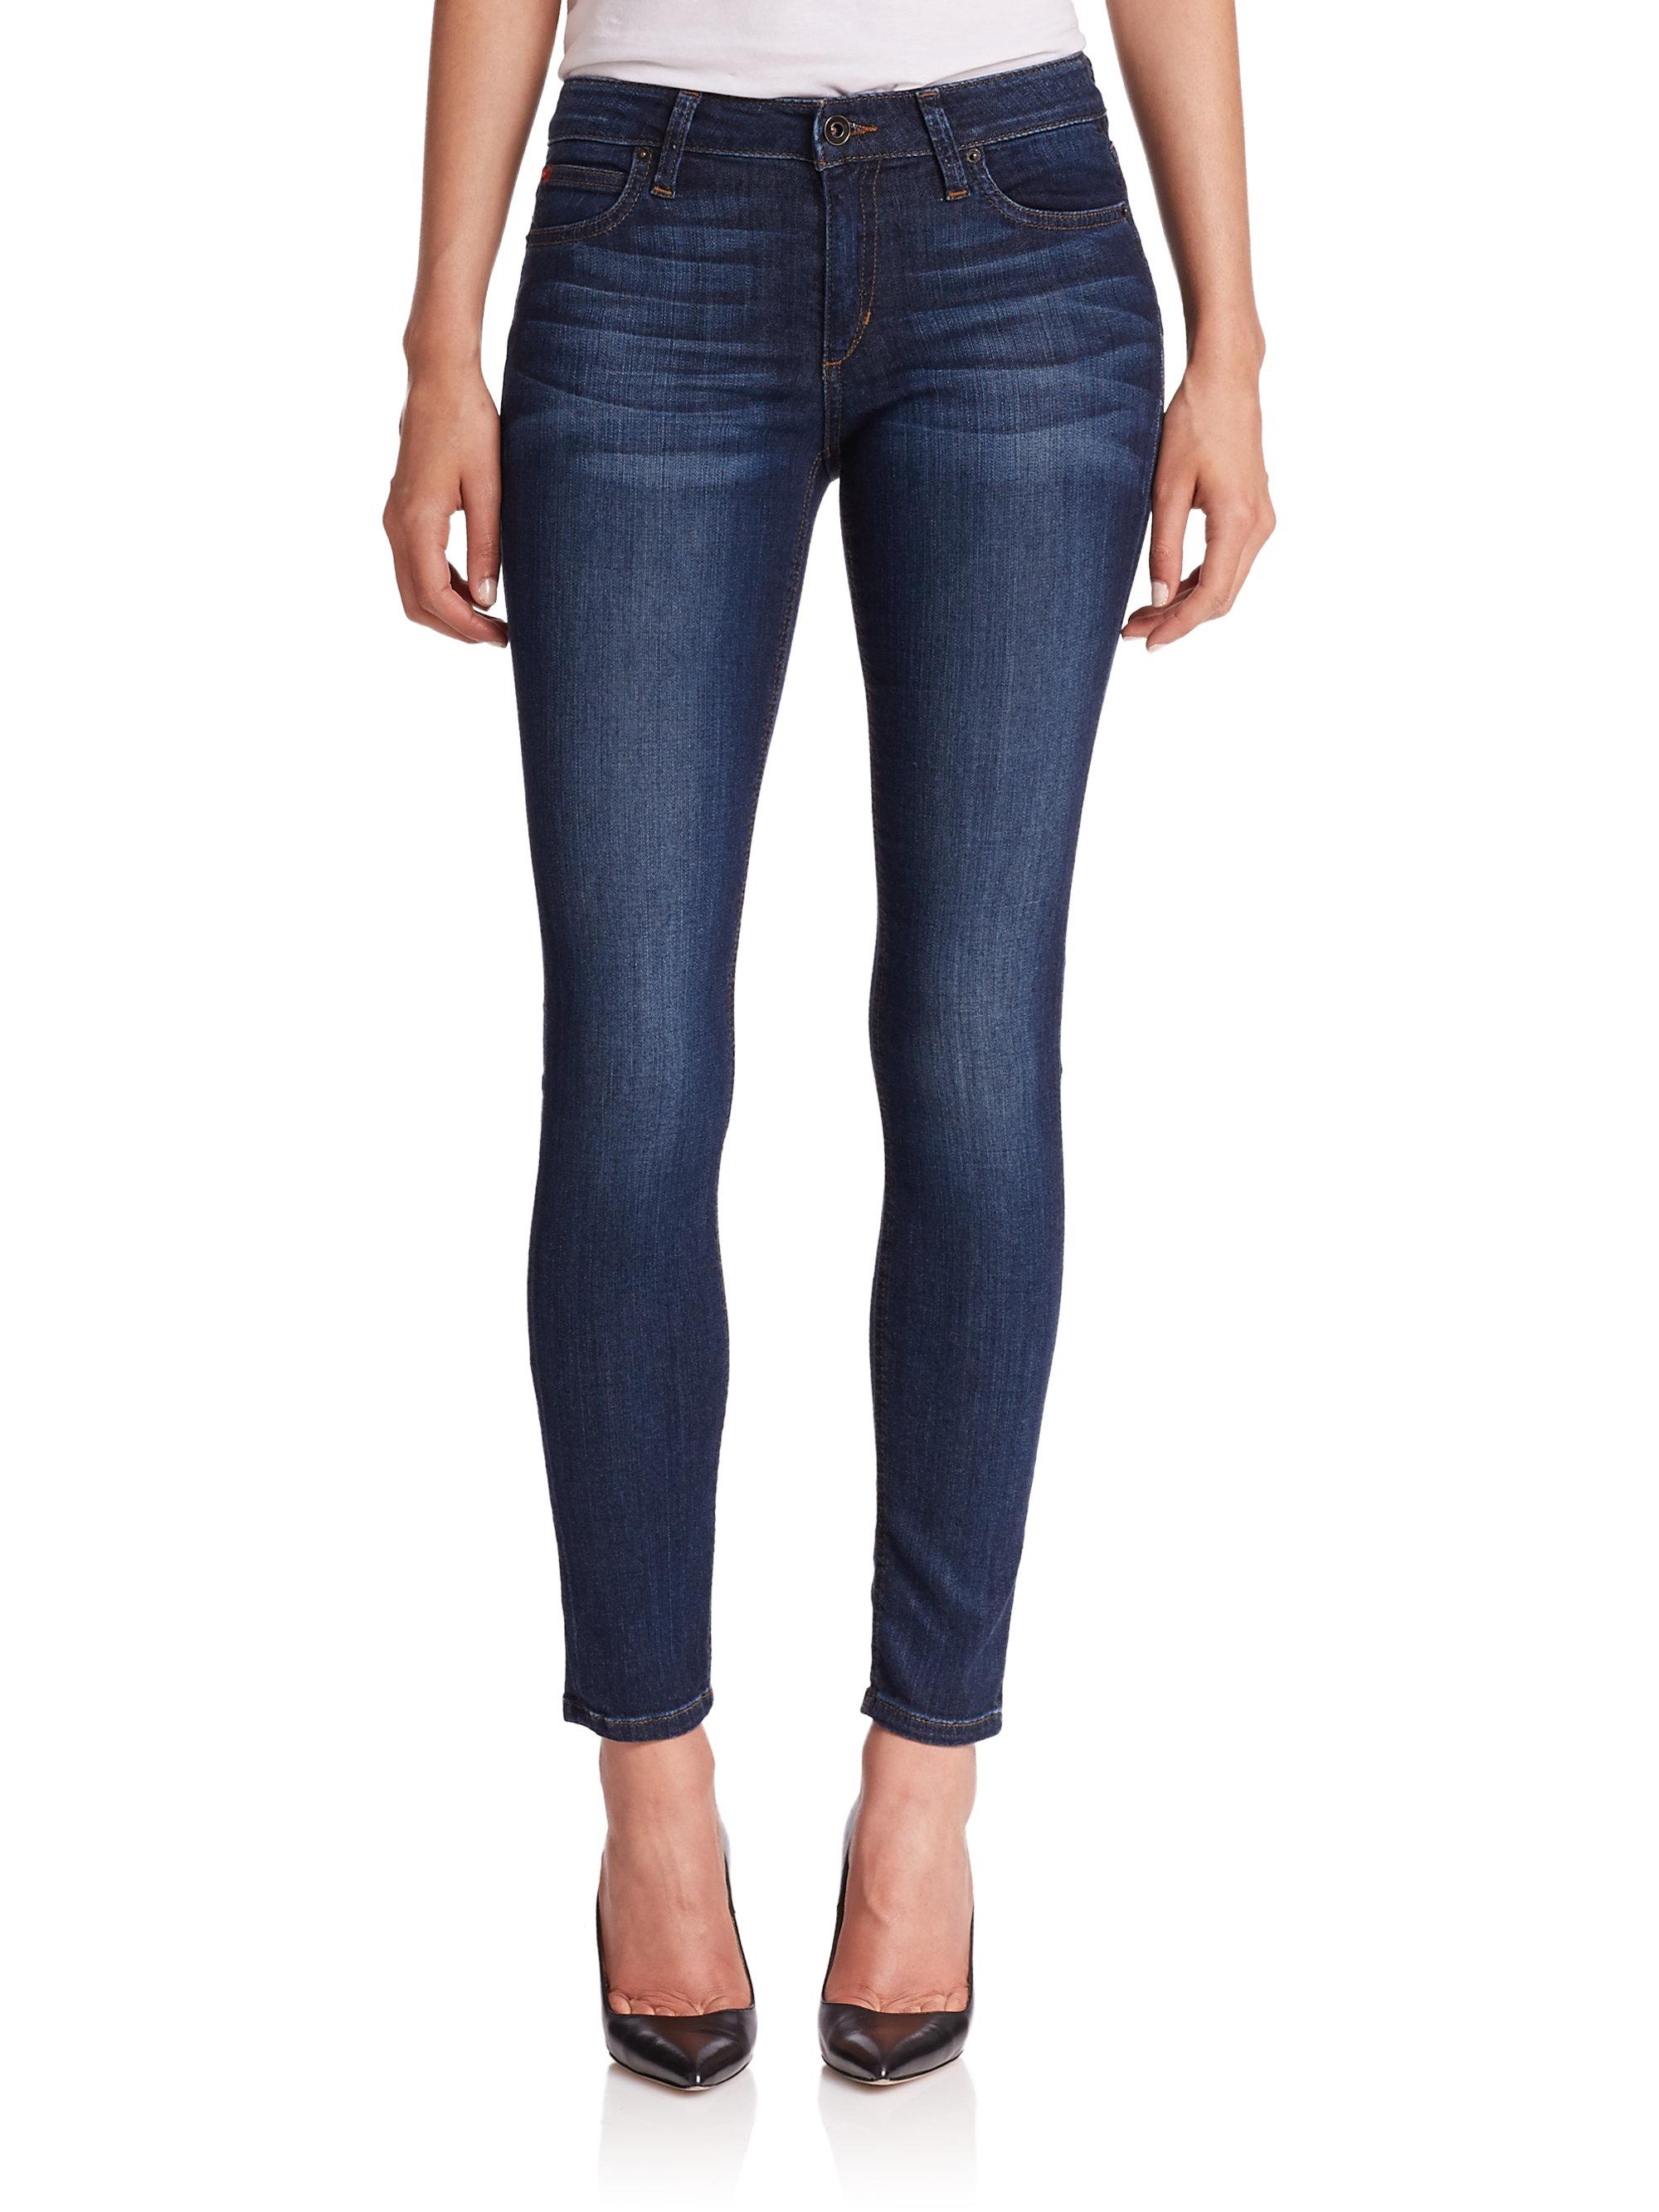 Burgundy Skinny Jeans Women